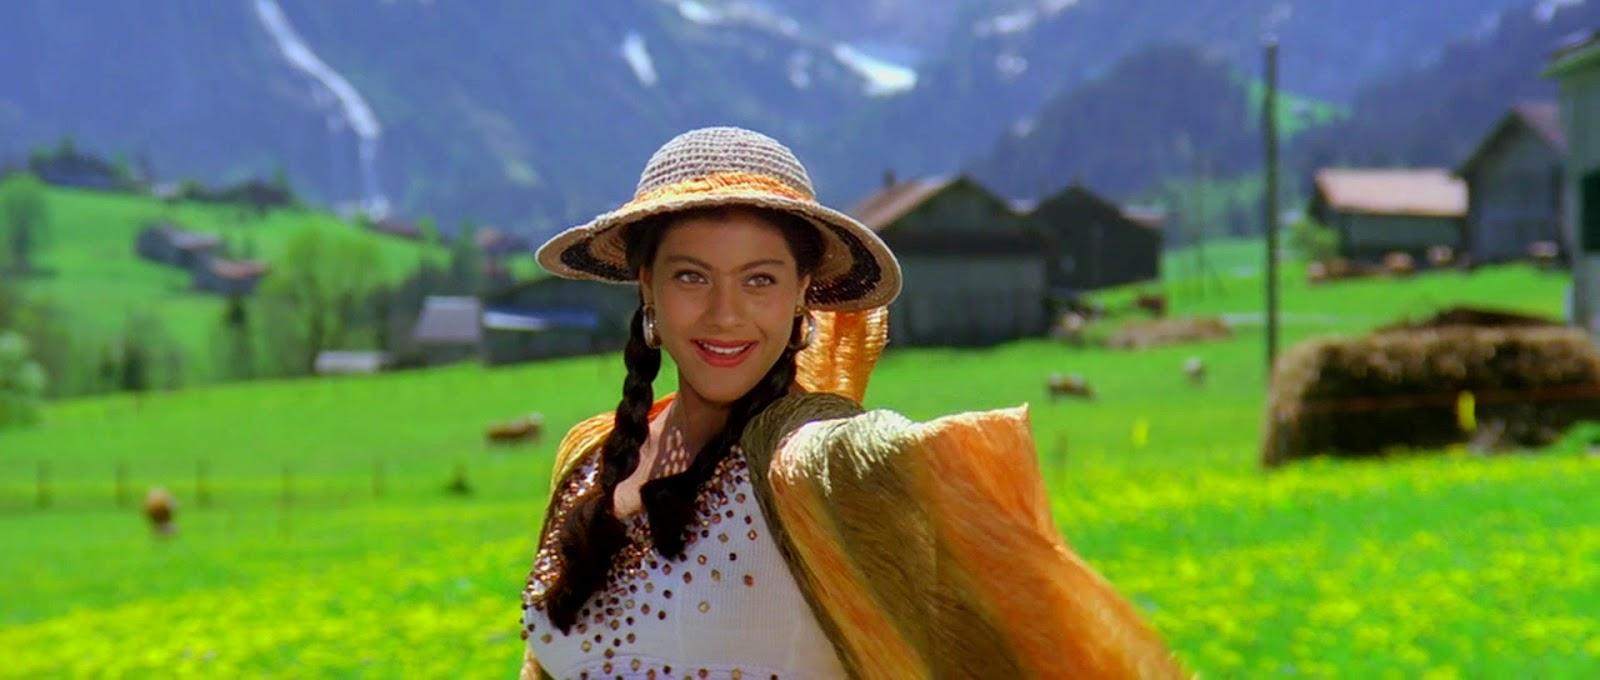 Dilwale Dulhania Le Jayenge (1995) BluRay 1080P (DTS-HDMA ...